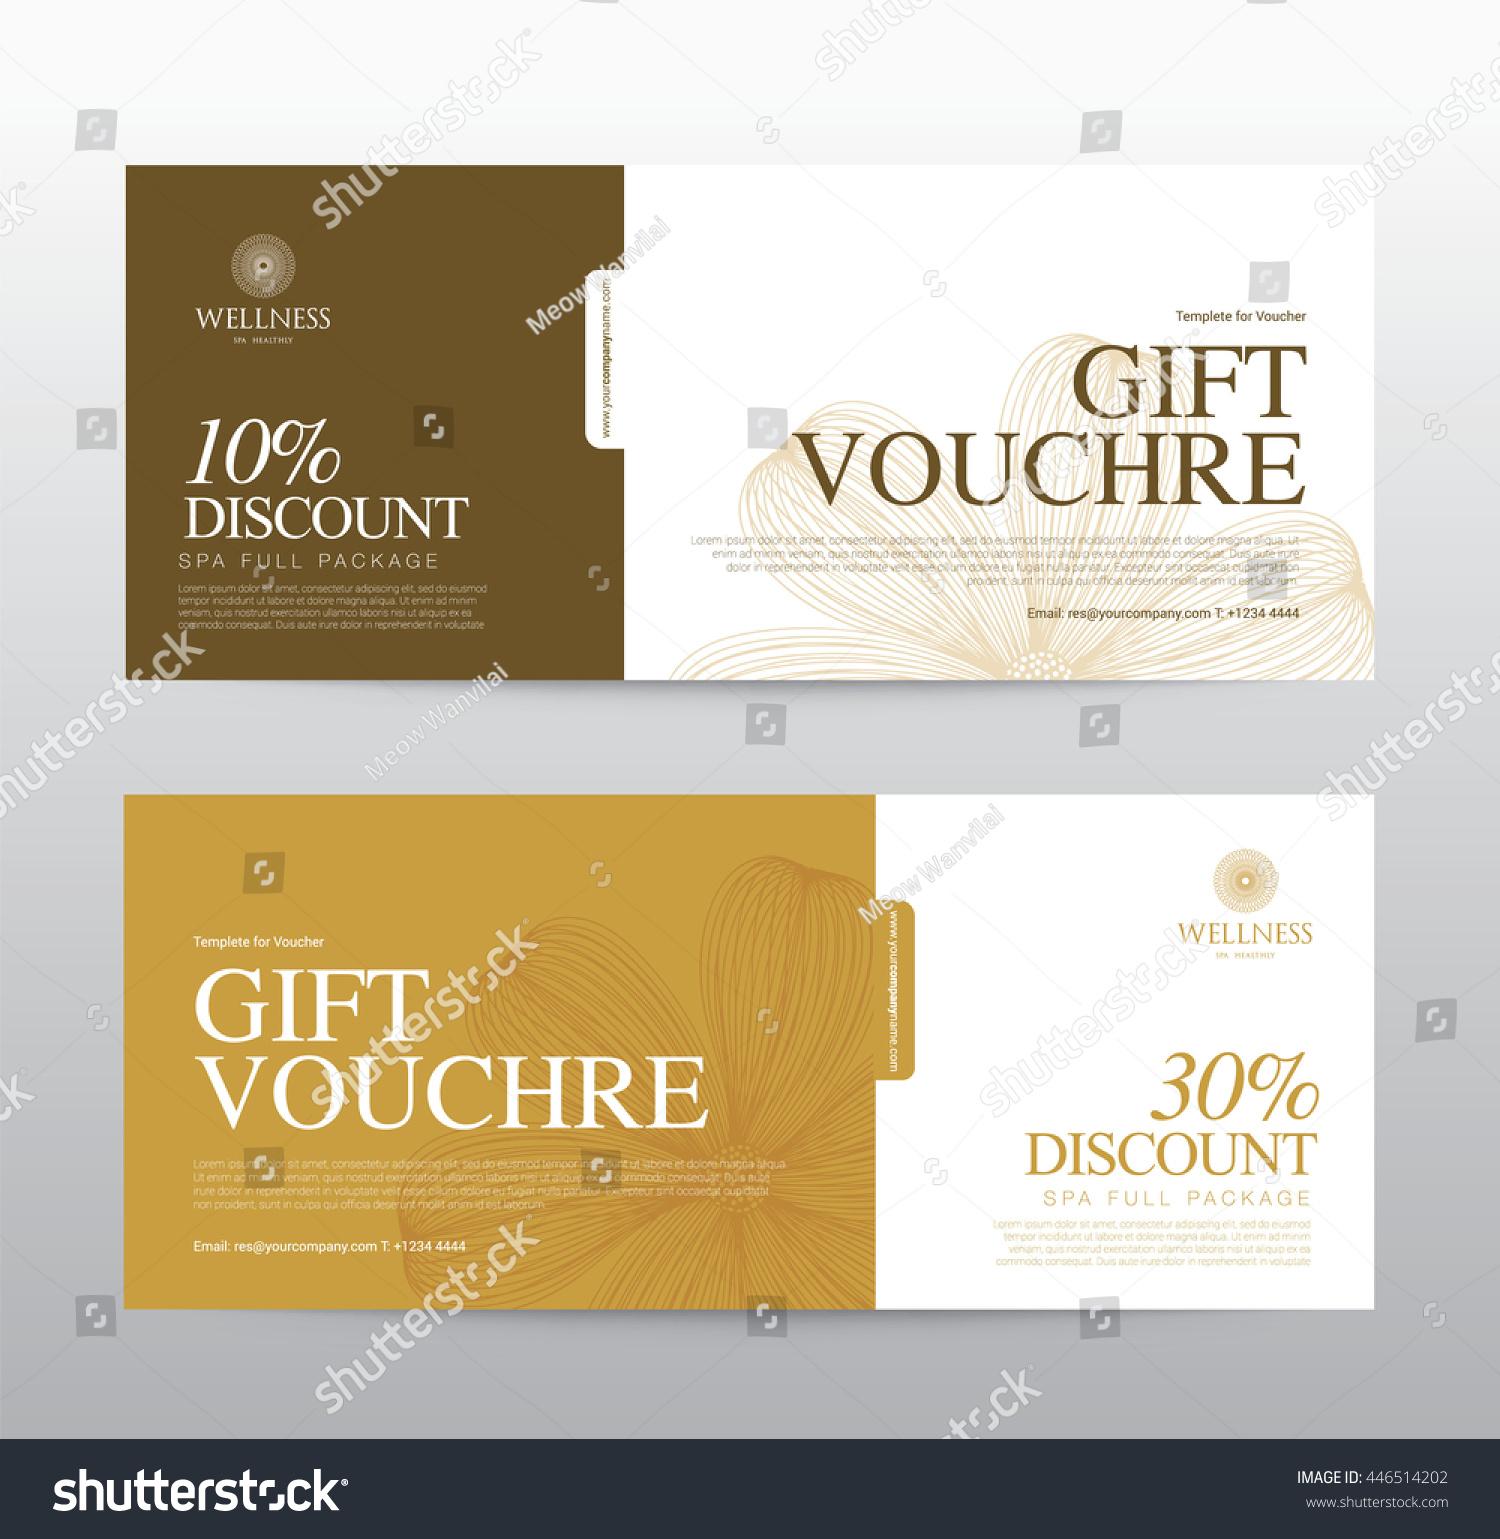 Gift Voucher Template For Spa, Hotel Resort, Vector Illustration  Hotel Gift Certificate Template